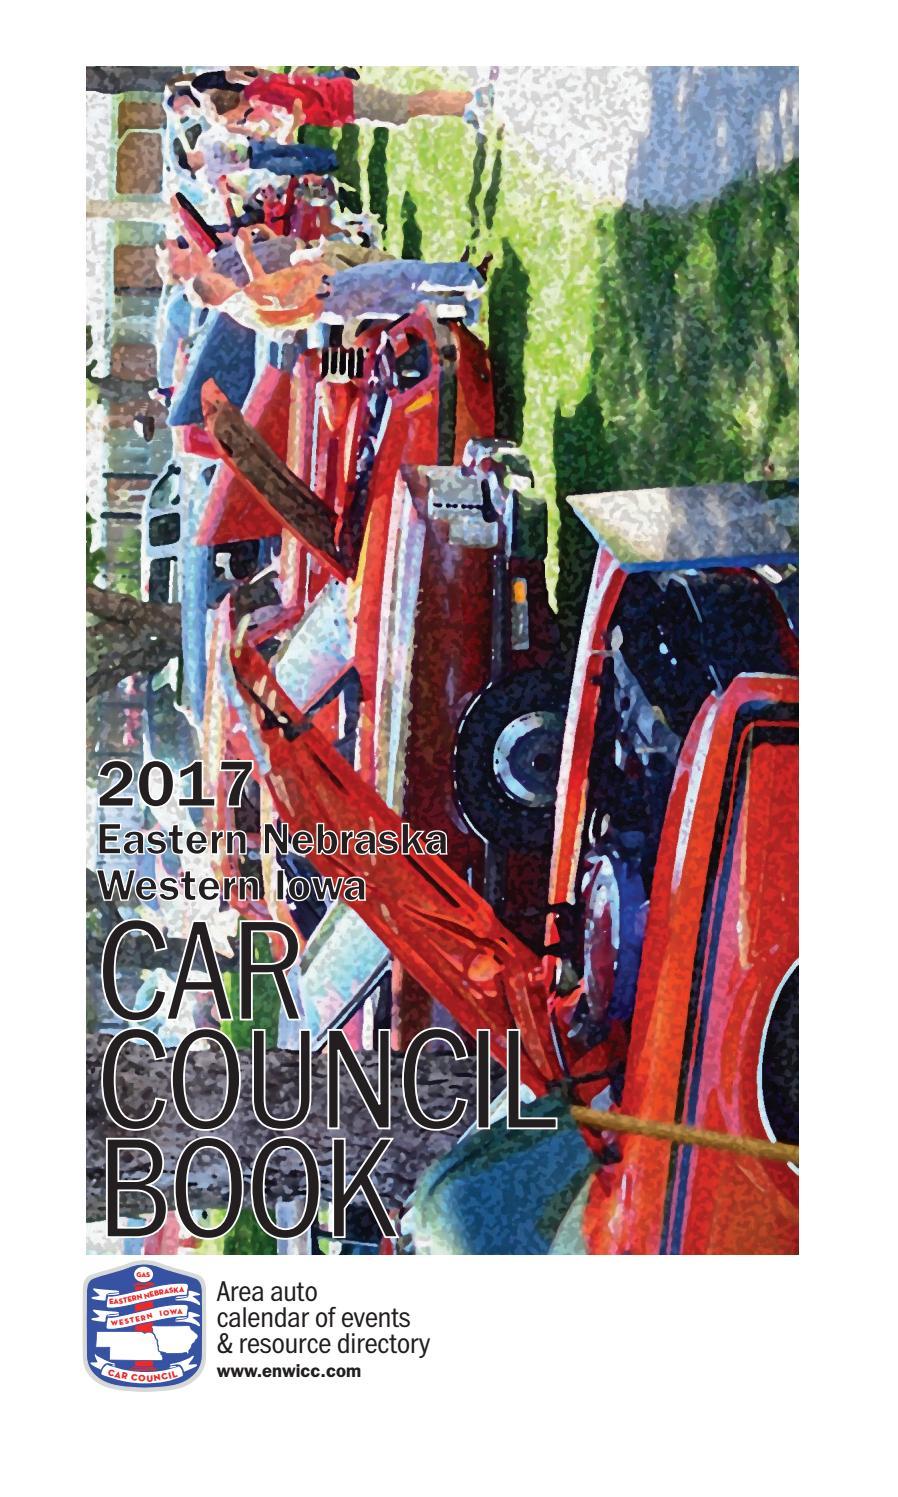 2017 Eastern NebraskaWestern Iowa Car Council Book